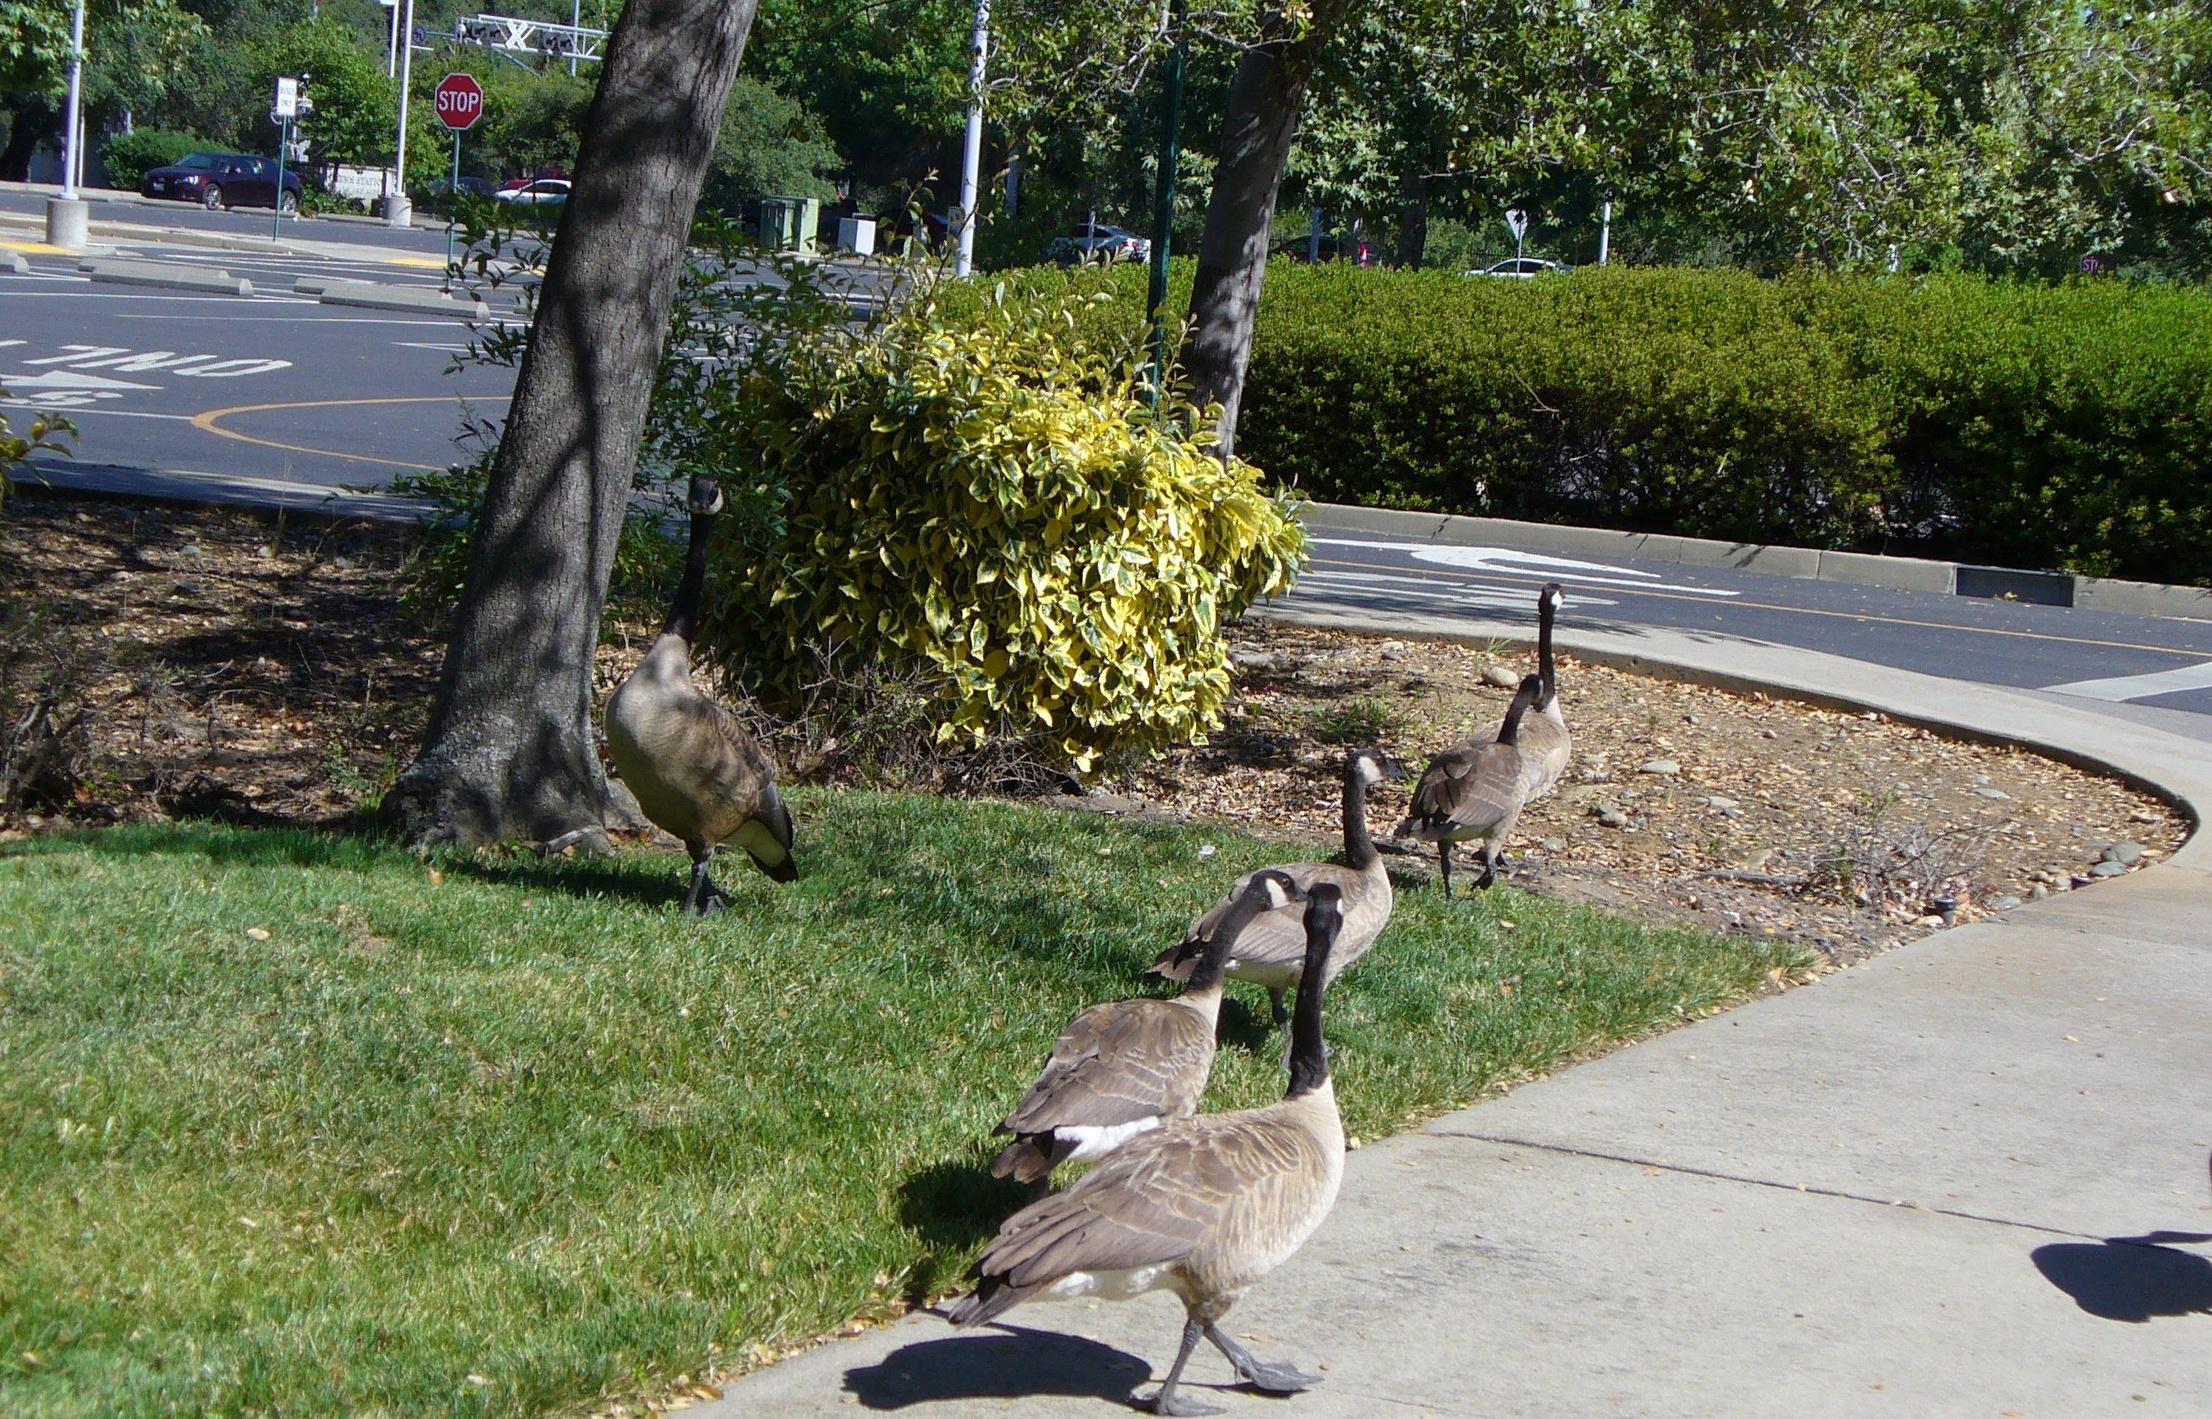 geese-by-street-folsom-20190713-75